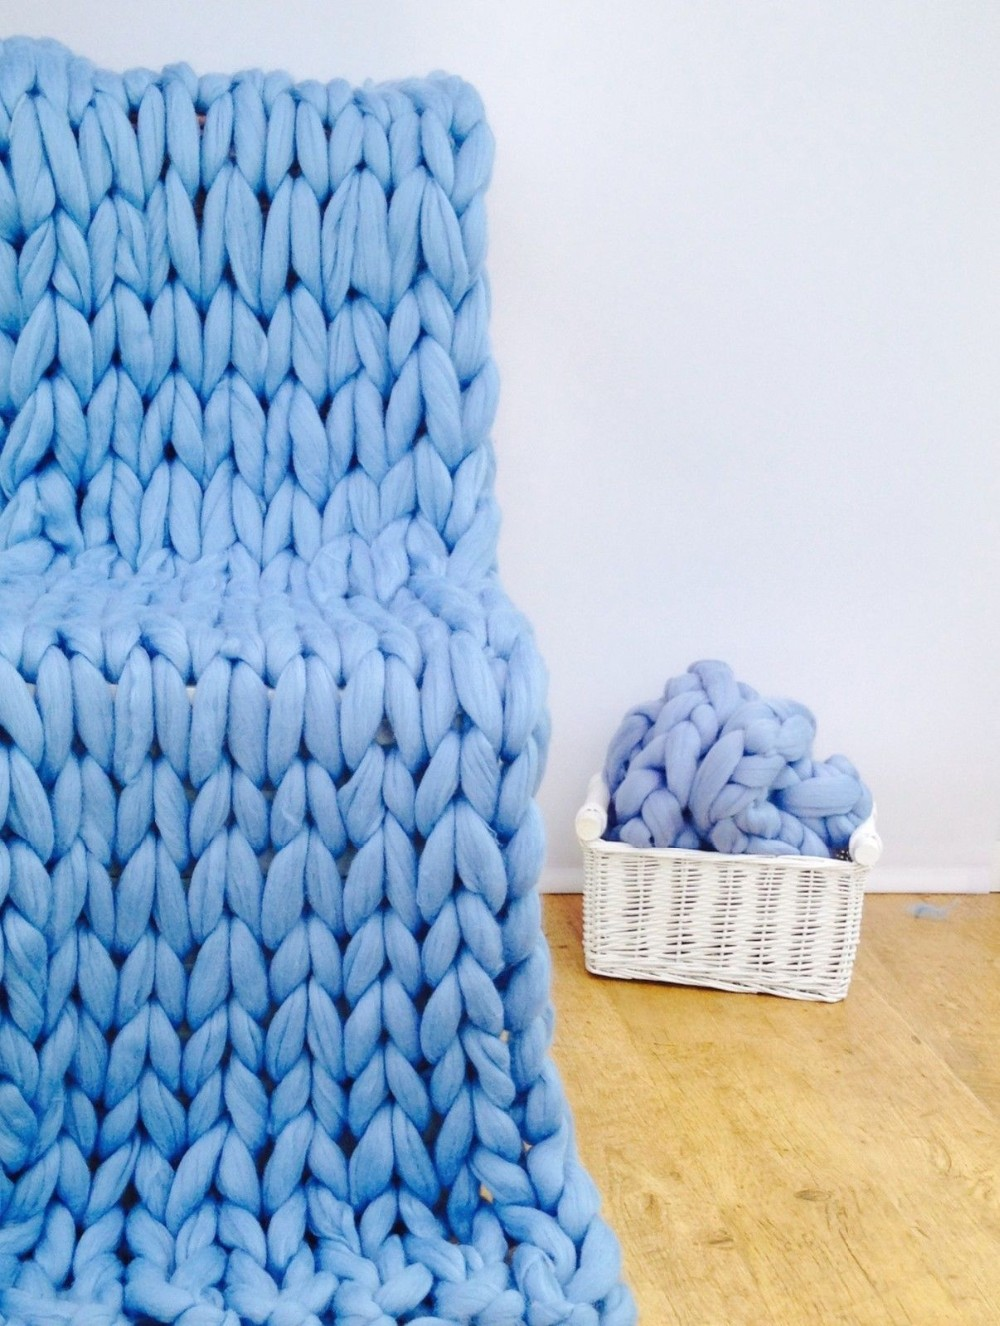 1 Kg Ball Super Chunky Thick Merino Wool Yarn For Hand